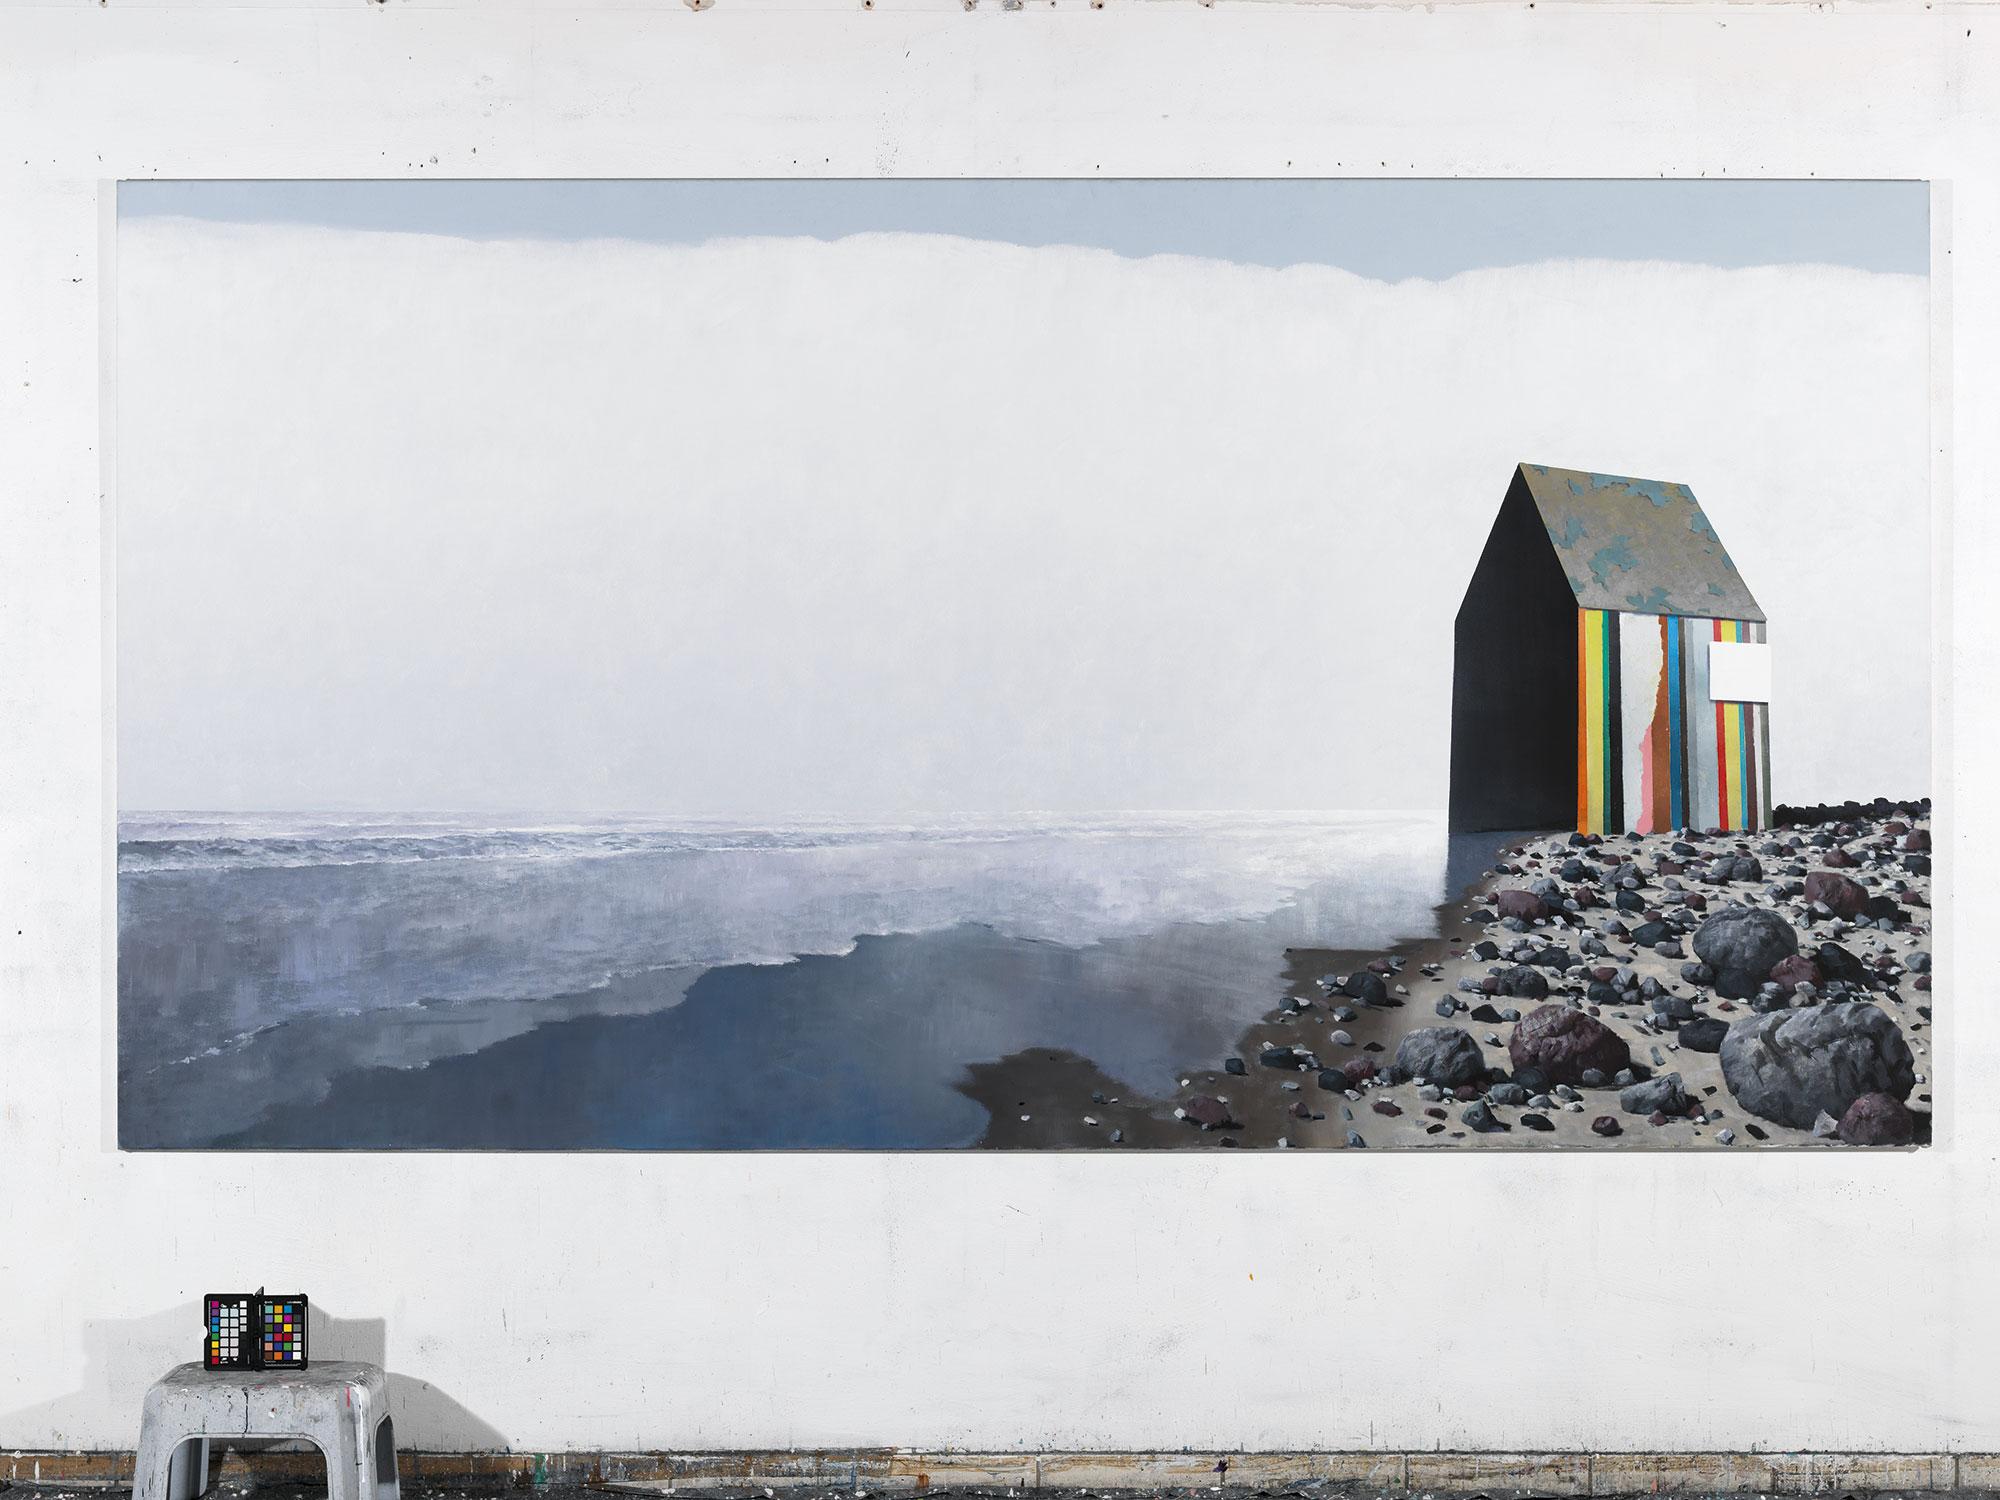 Gerhard Rießbeck, Haus am Strand, 2017, Öl auf Leinwand, 160 × 300 cm